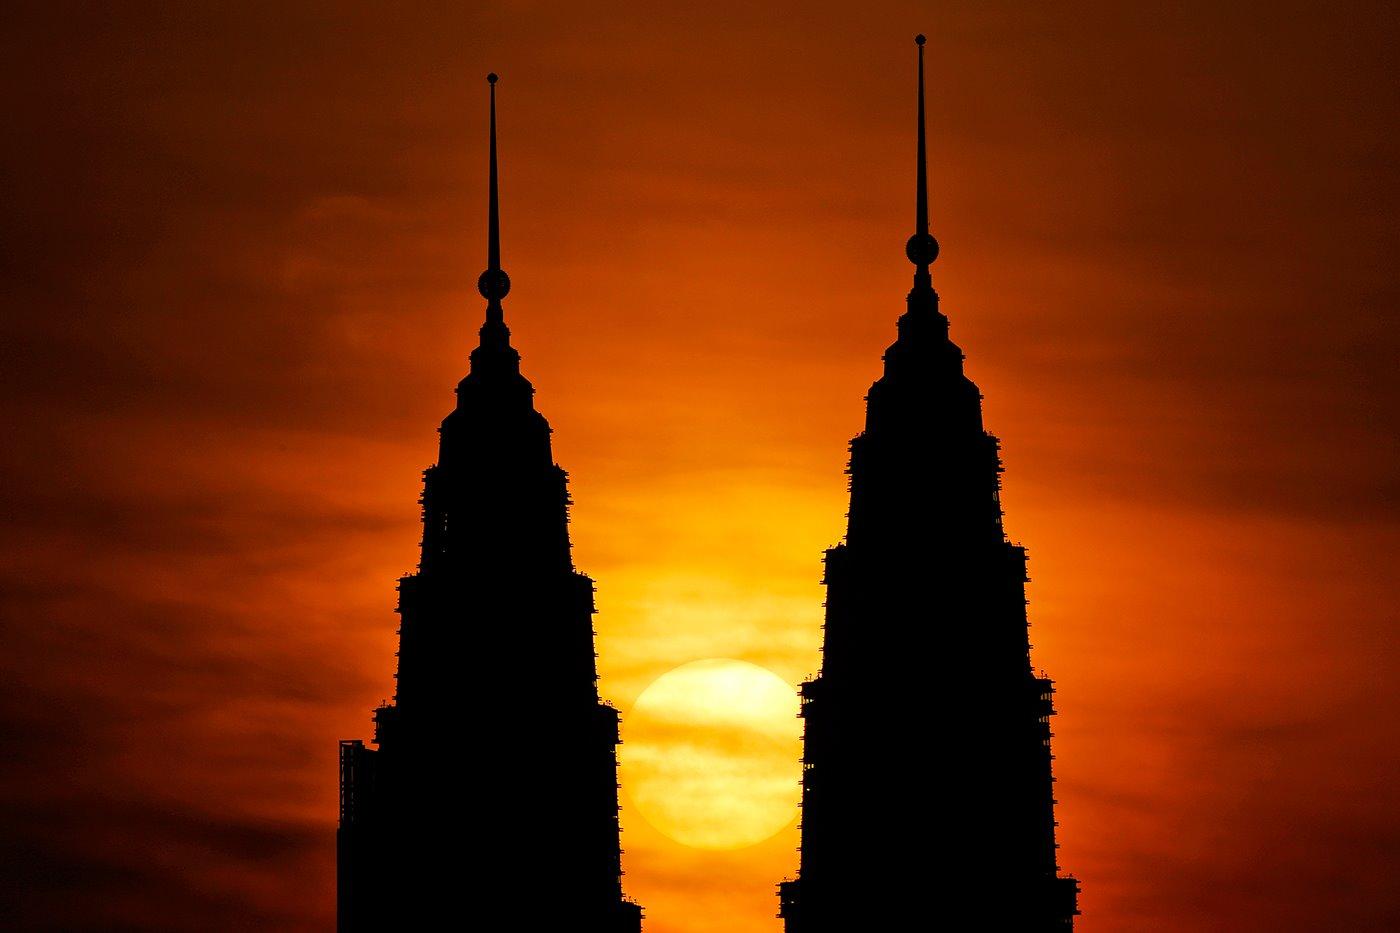 Torres Gemelas Petrona, Kuala Lumpur, Malasia. Torres Gemelas Petrona (Kuala Lumpur)